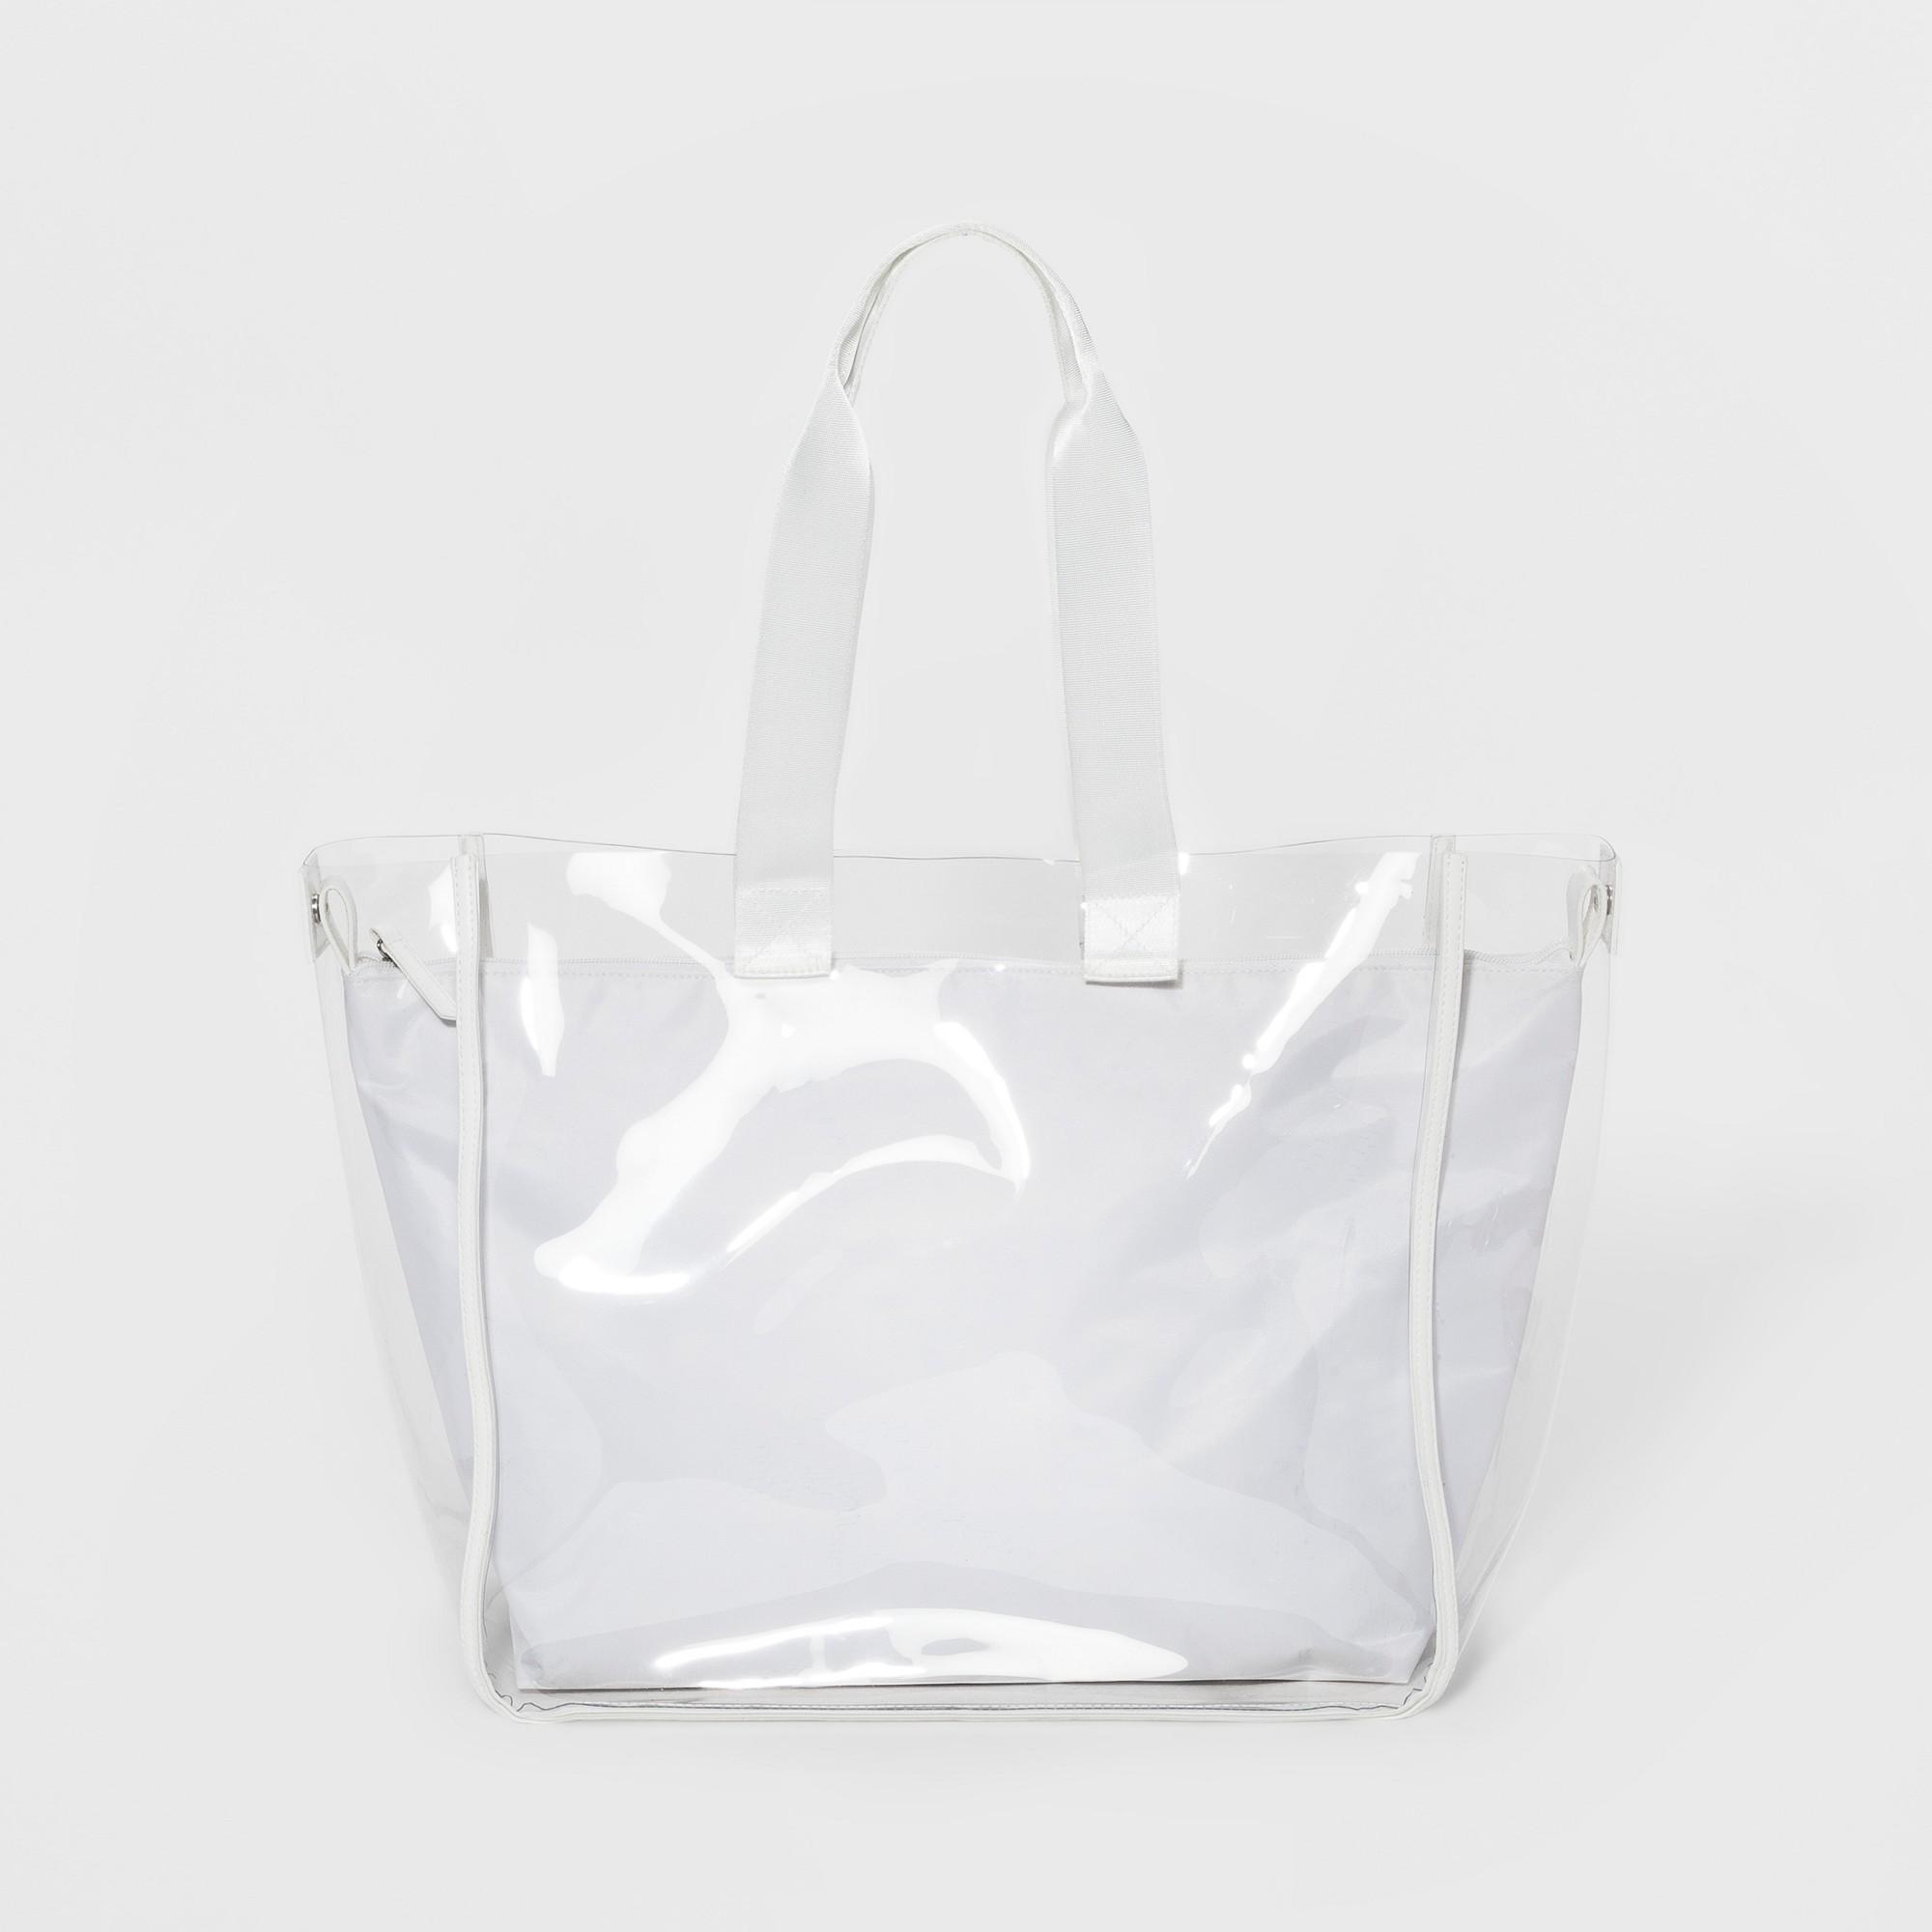 f60e5a7ae5 Keep A Secret Jelly Tote Handbag - Mossimo Supply Co. Clear ...